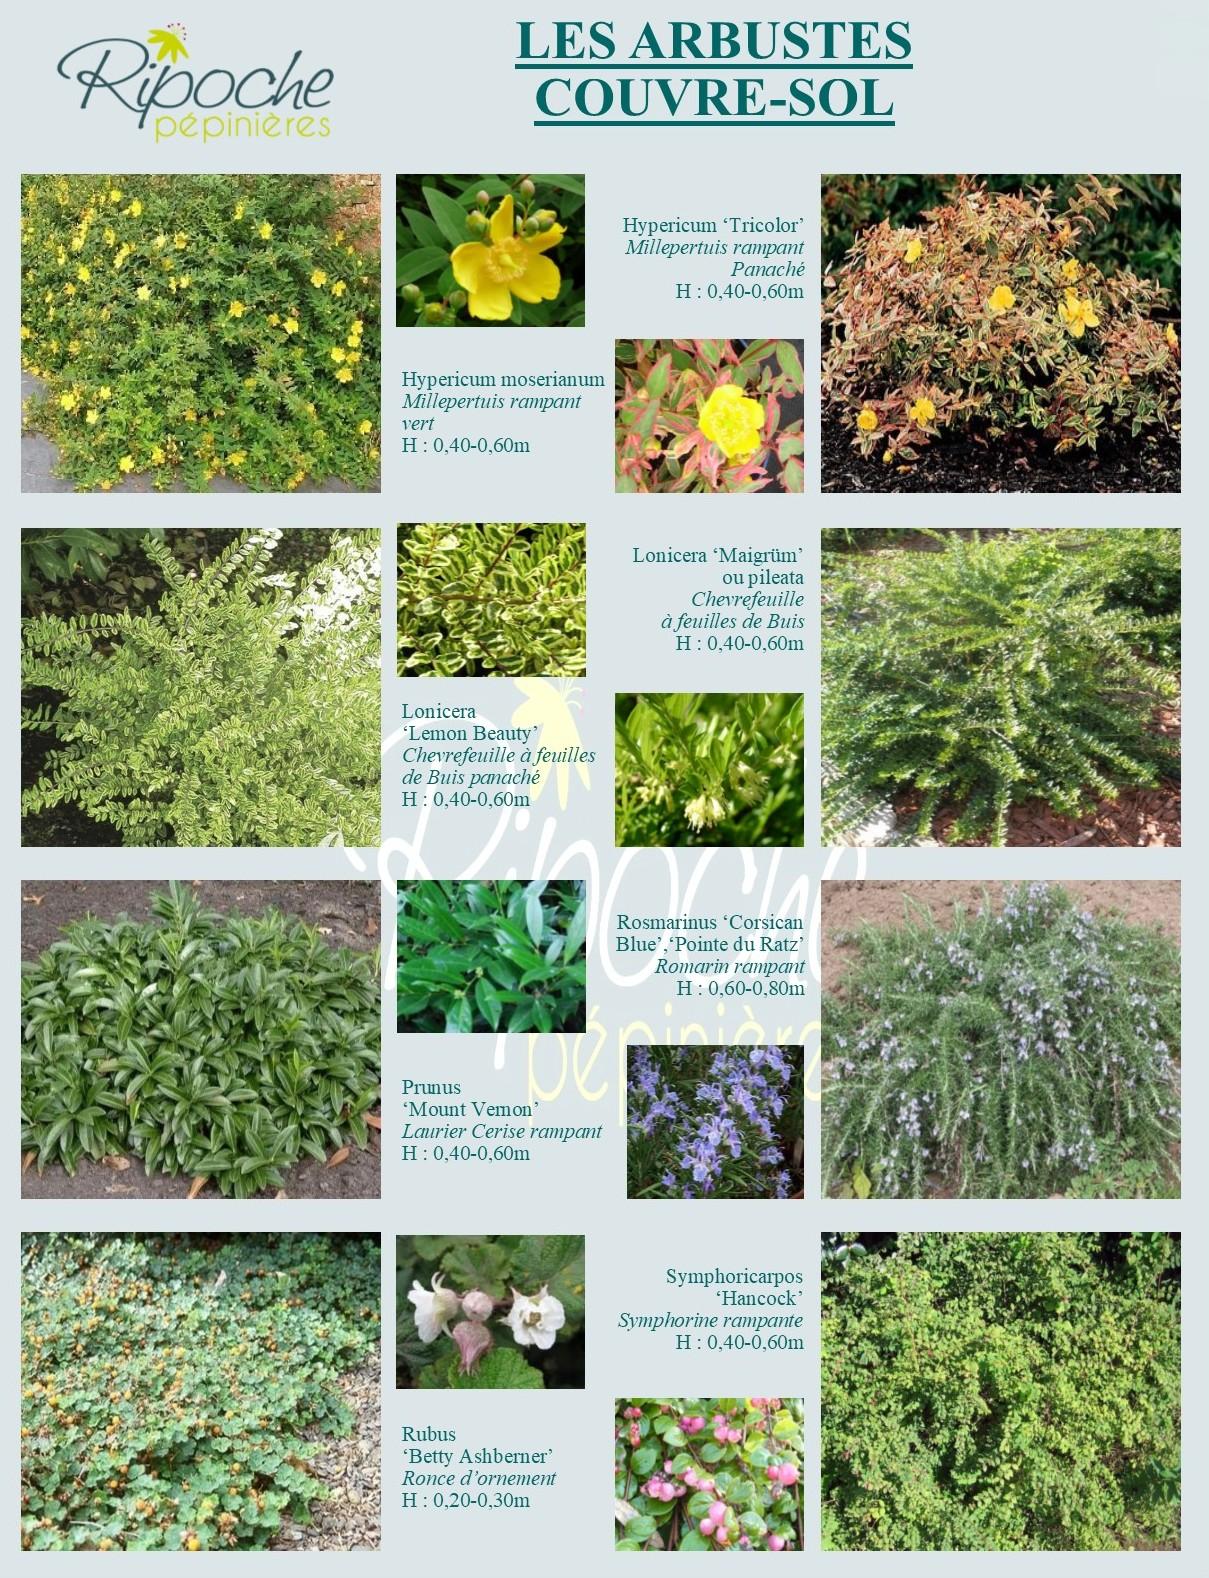 Arbustes couvre-sol2